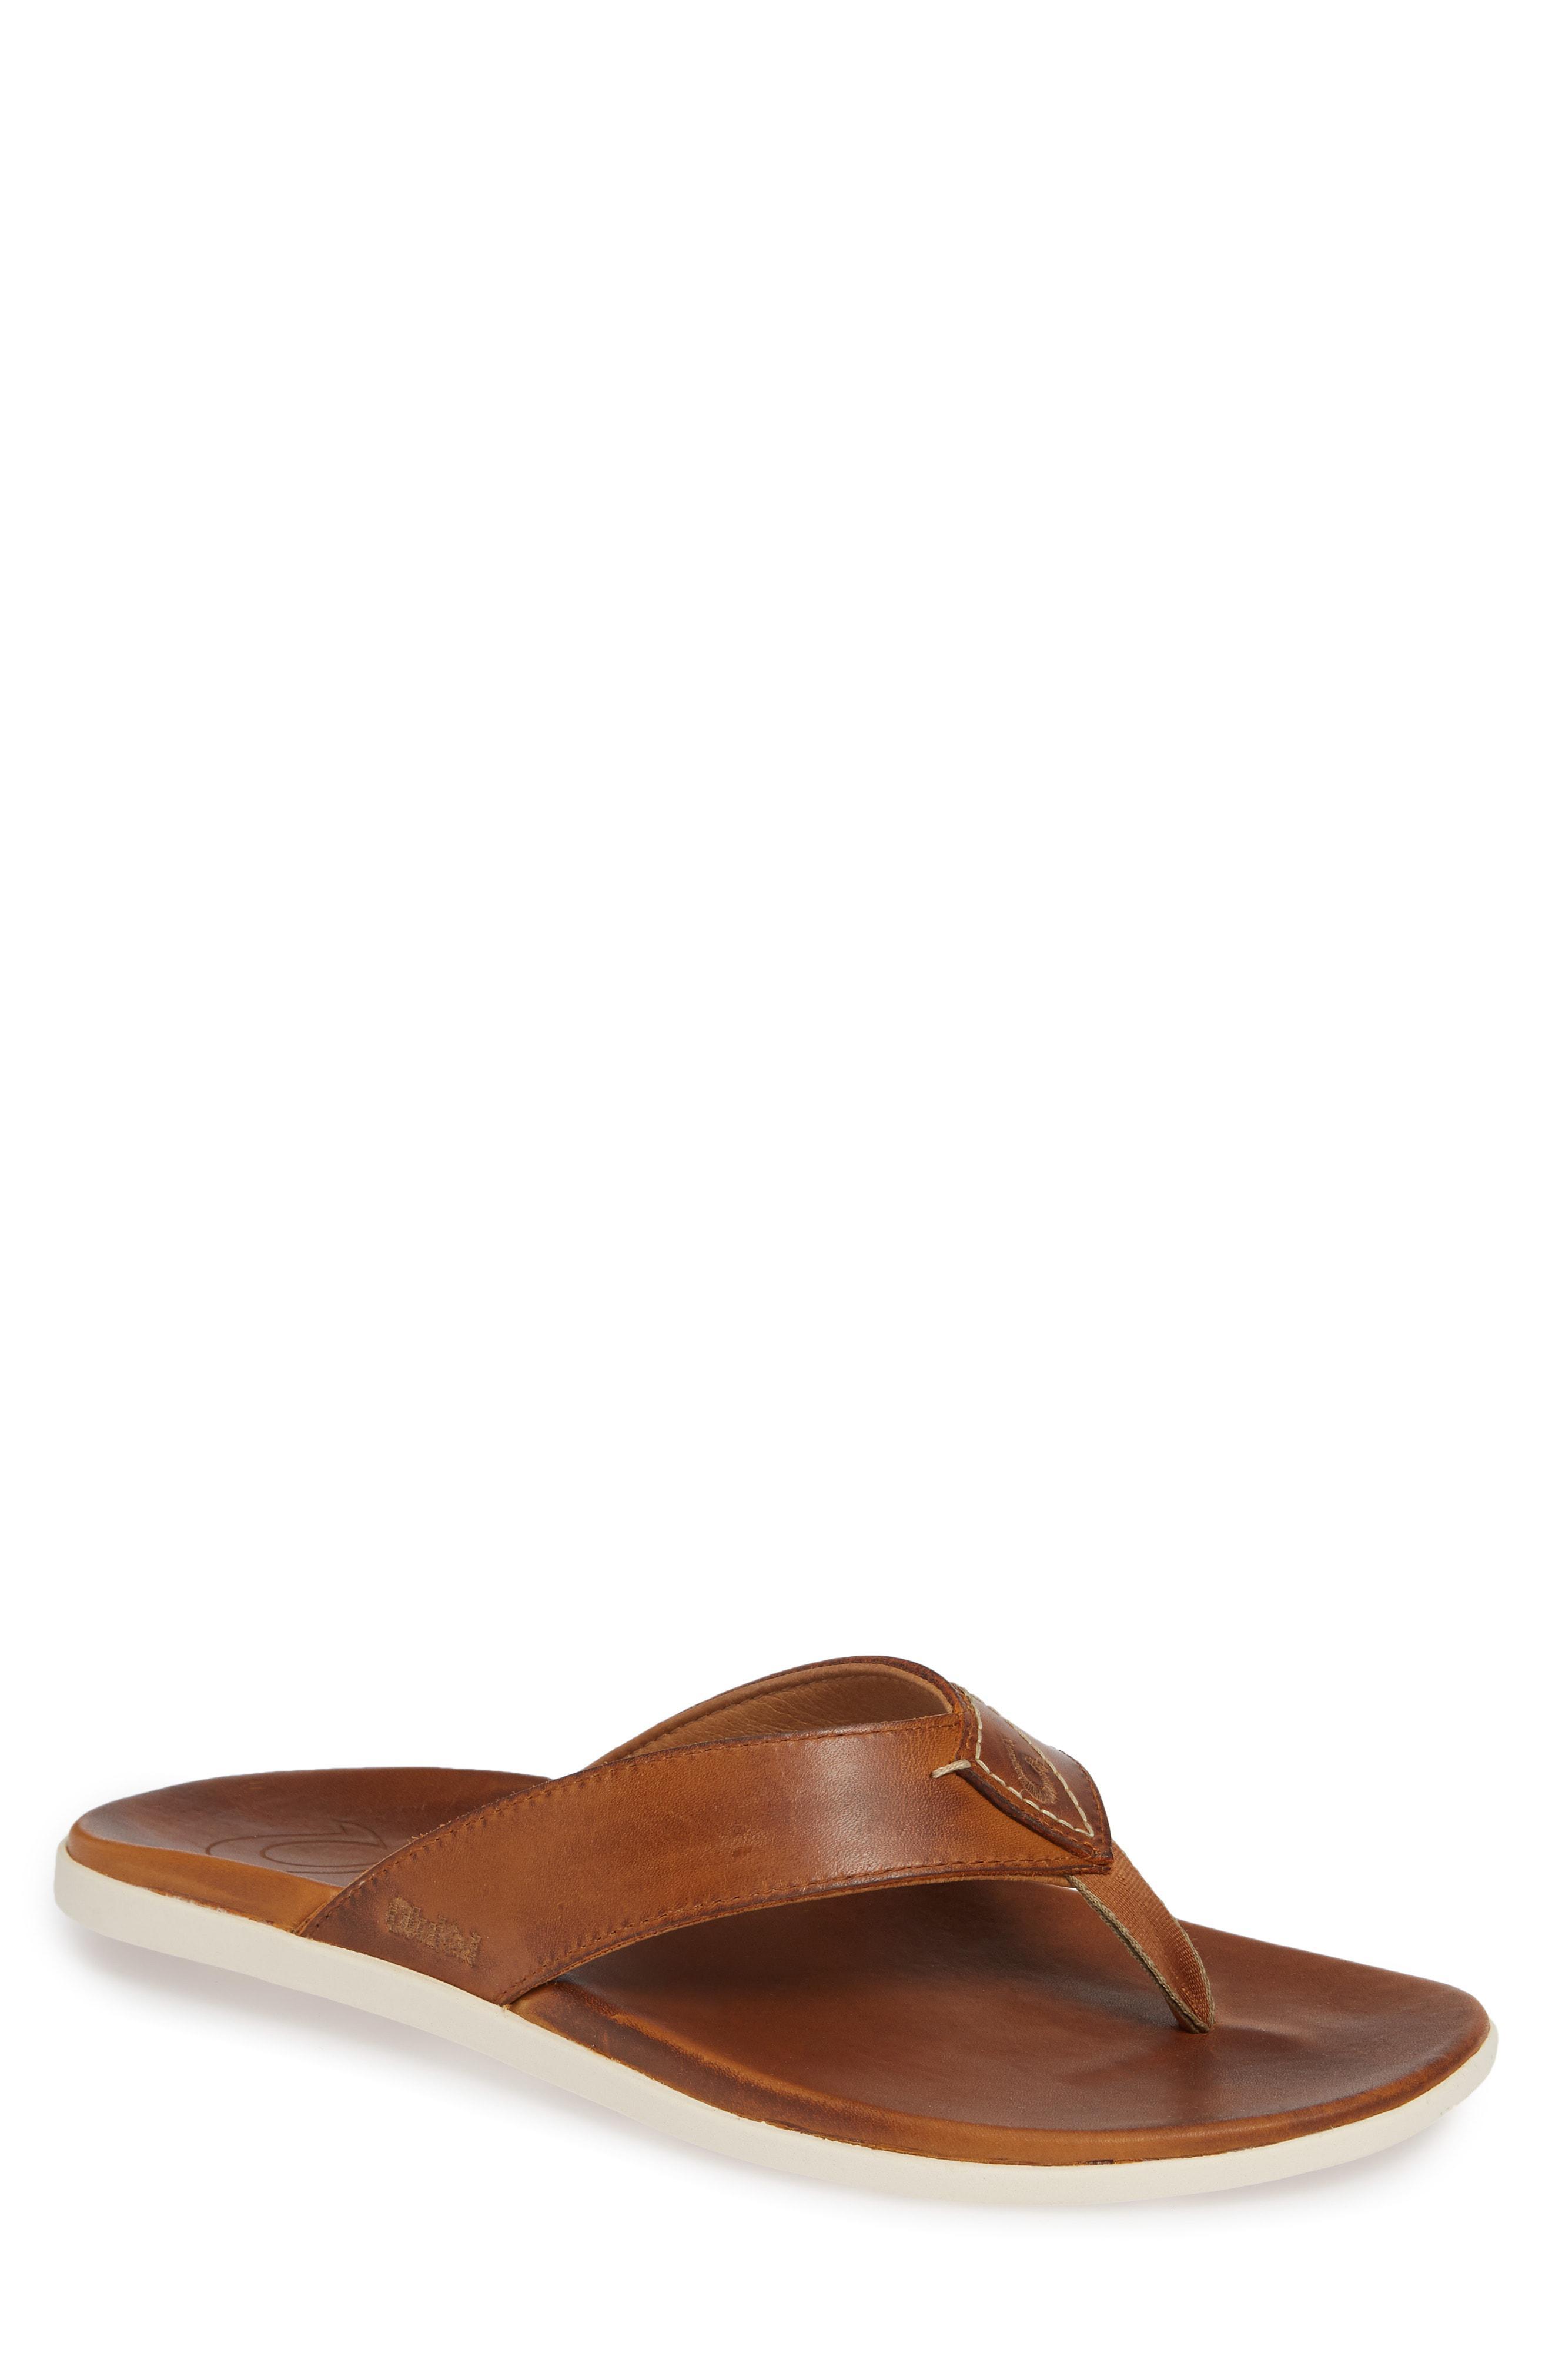 960d6a2c8af6 Lyst - Olukai Nalukai Flip Flop in Brown for Men